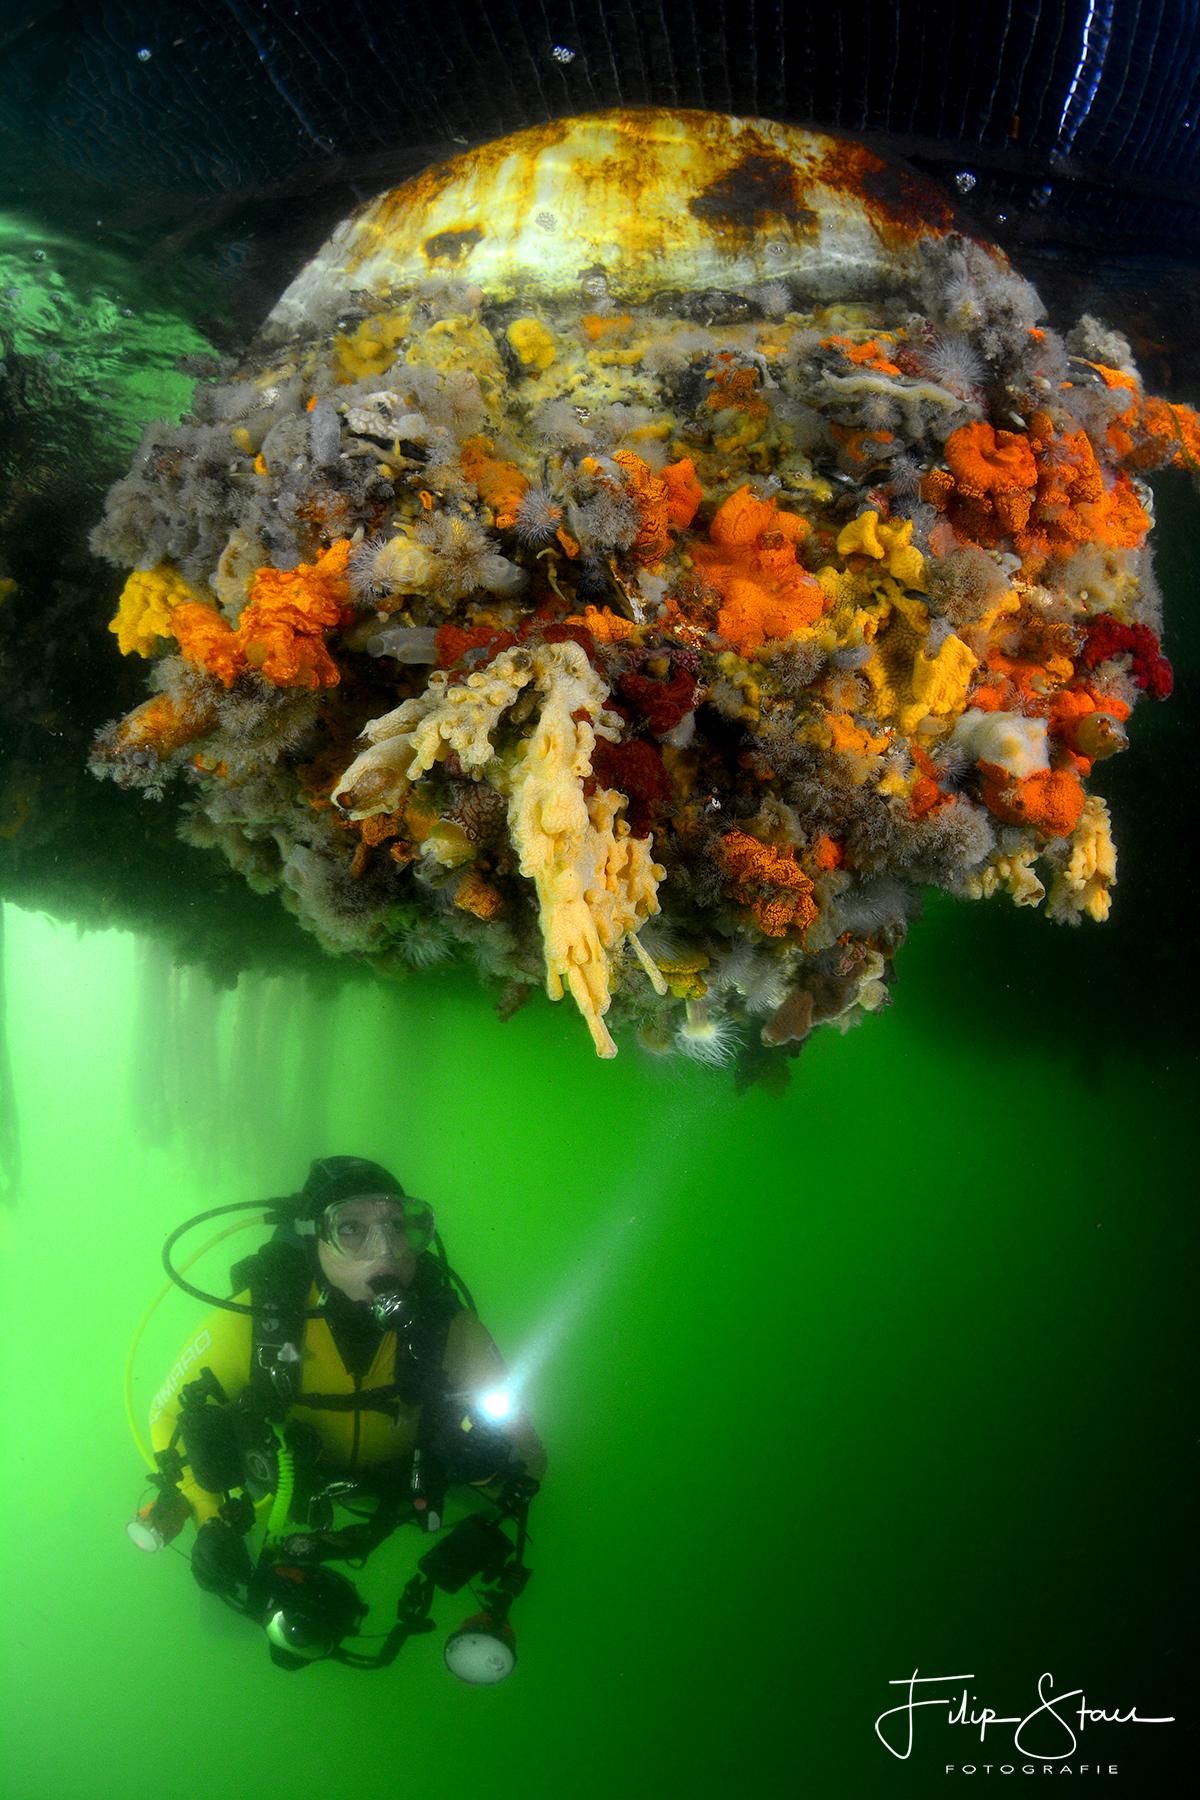 1ste-plaats-onk-groothoek-met-duiker-2016